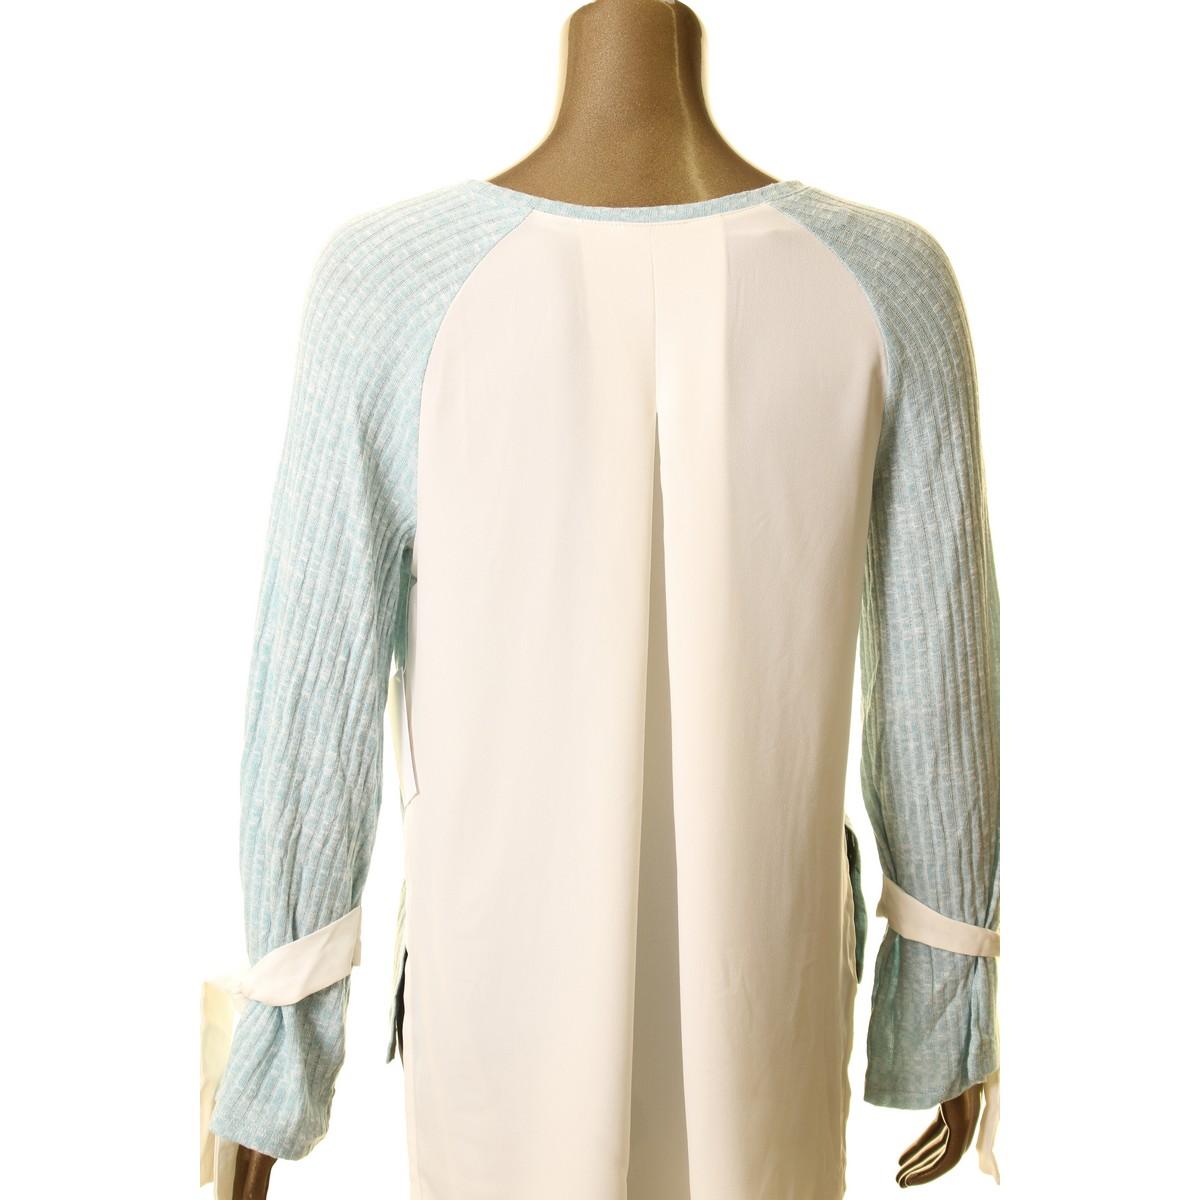 KENSIE-NEW-Women-039-s-Tie-Sleeve-Ribbed-Chiffon-Back-Knit-Shirt-Top-TEDO thumbnail 5